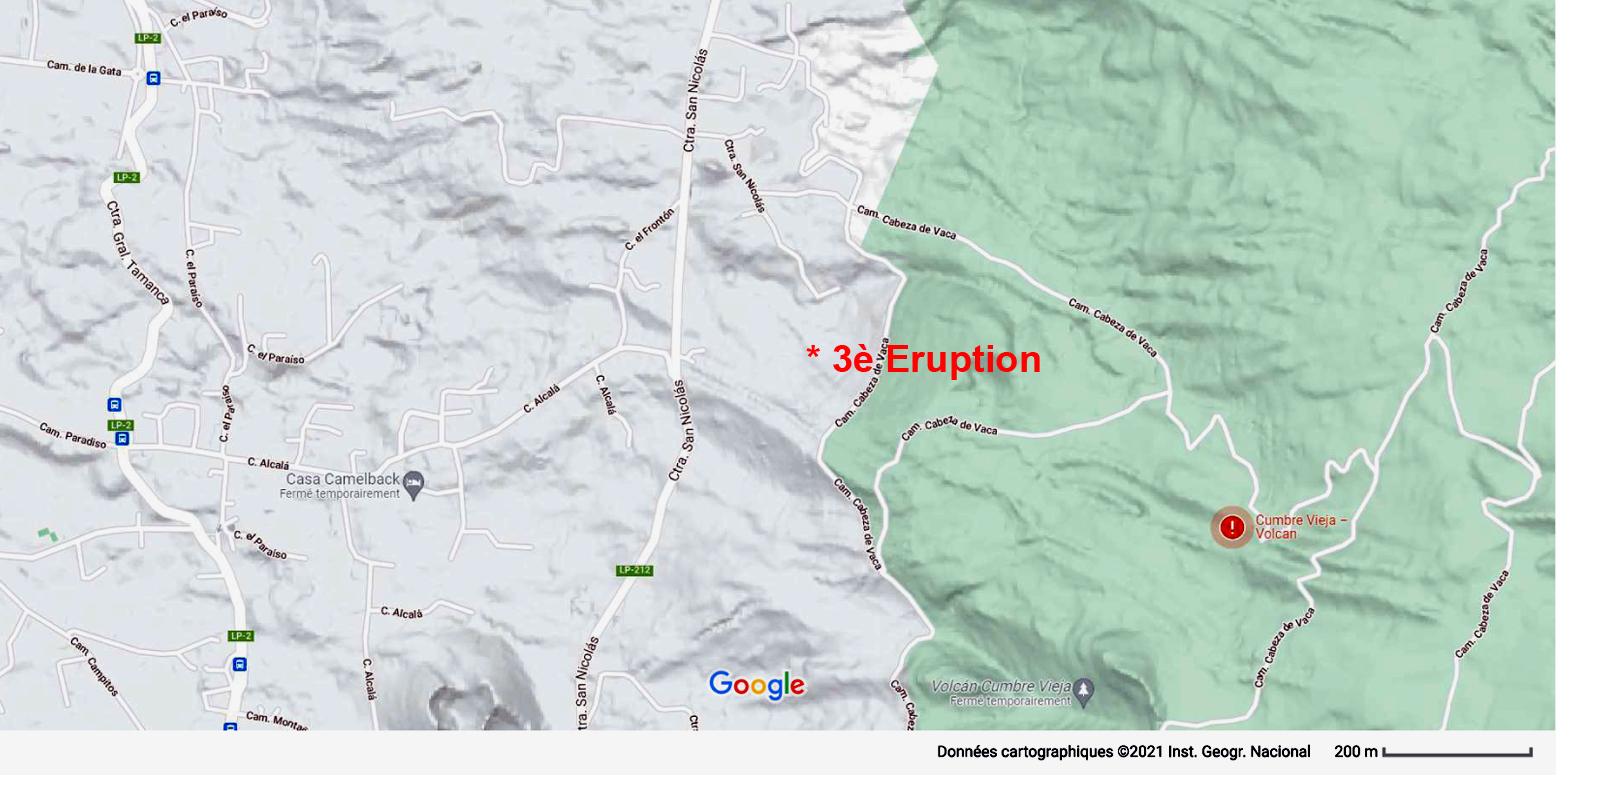 Eruption du volcan Cumbre Vieja - Ile de Palma - Canaries Crat3g10